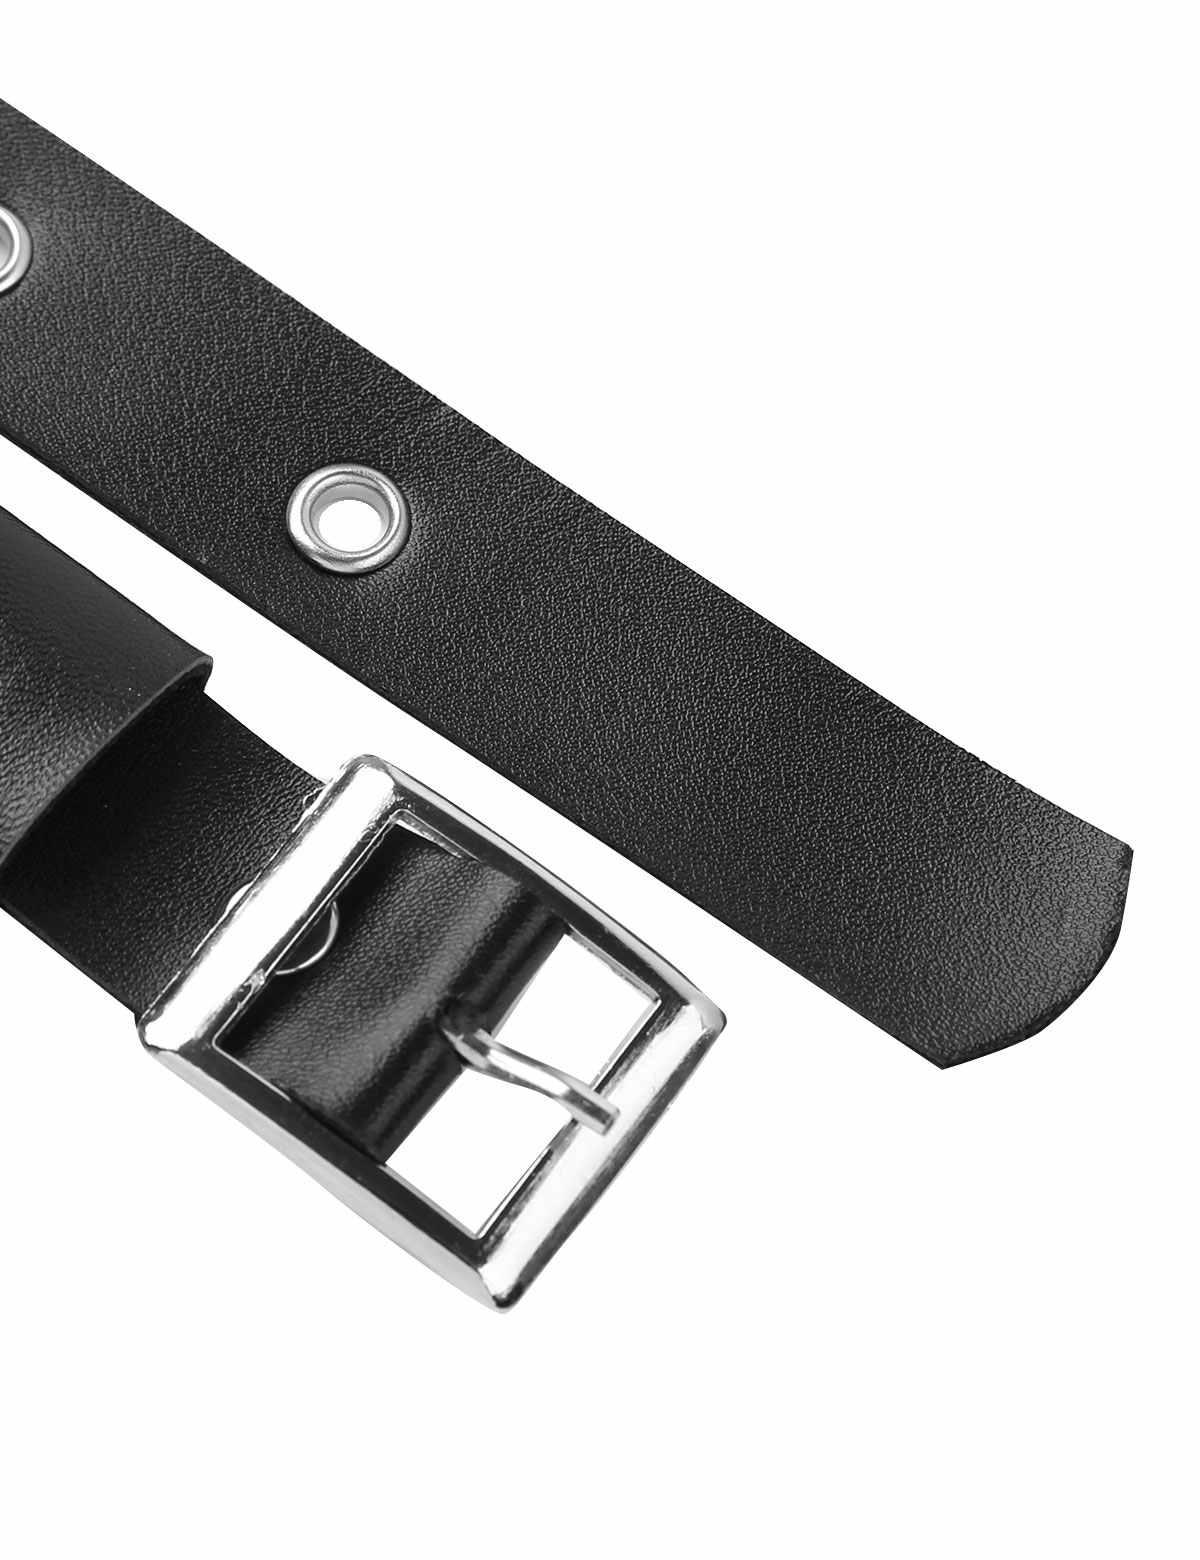 Mannen Zwart PU Lederen Body Borst Harnas Clubwear Kostuum Halter Verstelbare Gesp Riem Borst Harnas Riem met Metalen Ketting